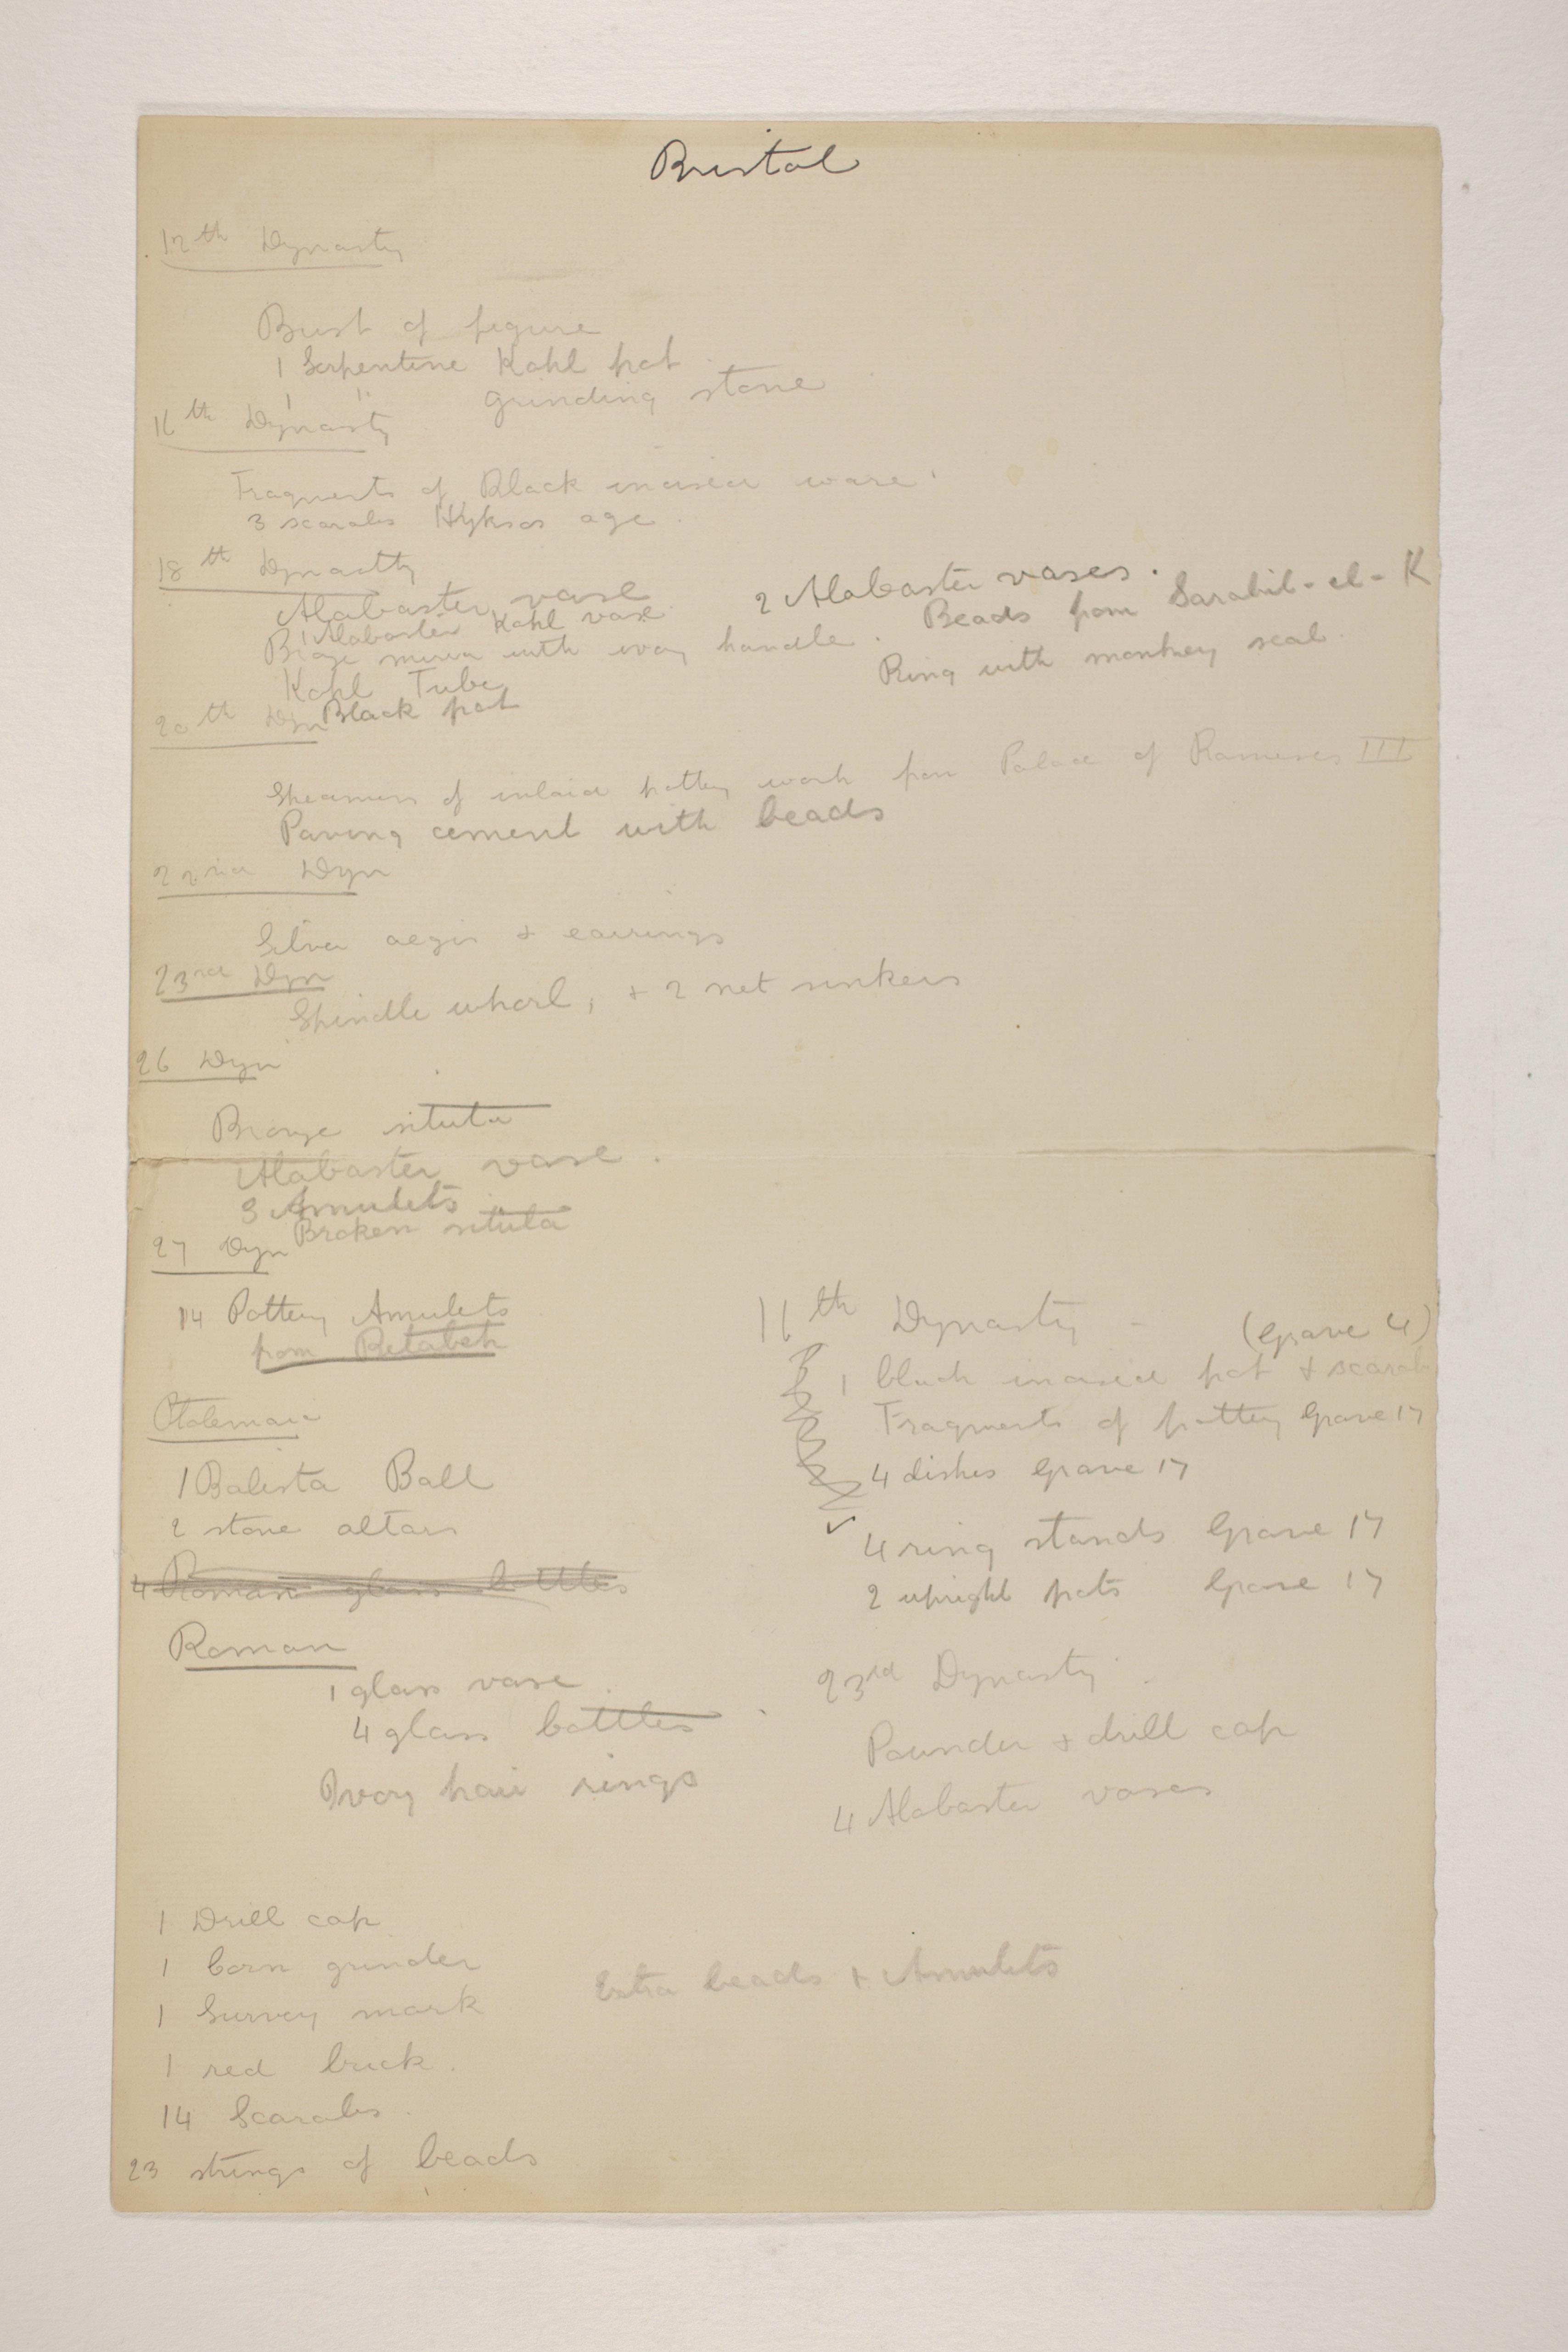 1905-06 Eastern Delta: Belbeis, Tell el-Rataba, Saft el-Hinna, Tell el-Yahudiya, Shaghanbeh, Ghita Individual institution list  PMA/WFP1/D/14/5